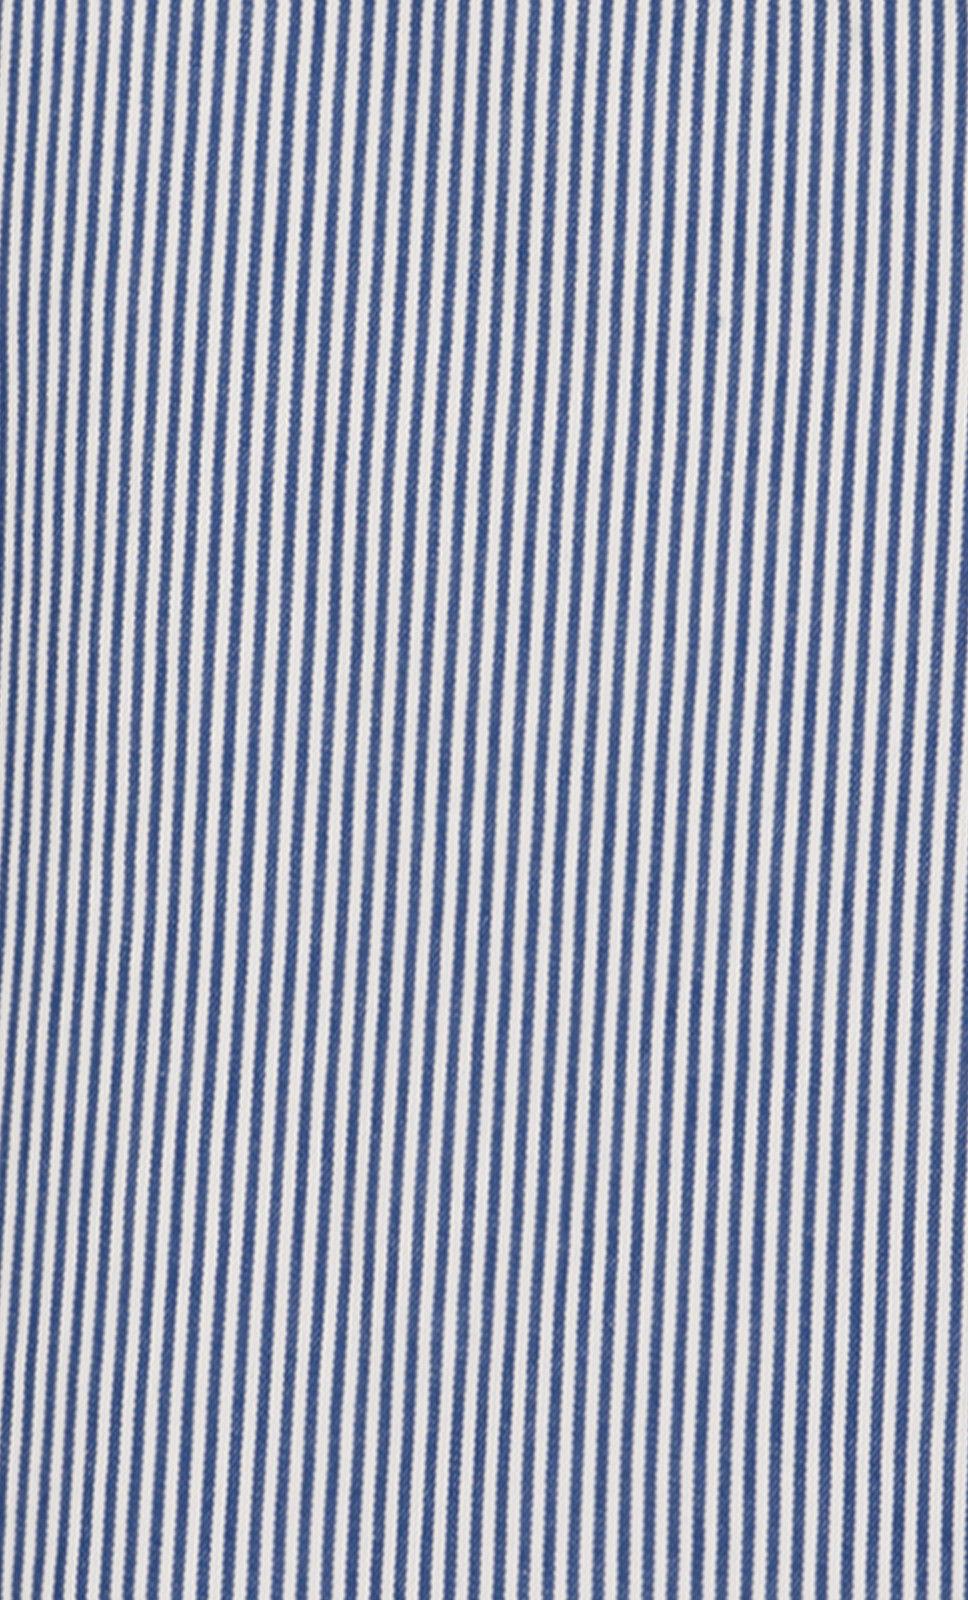 Americana-Stripe-Palace-Blue